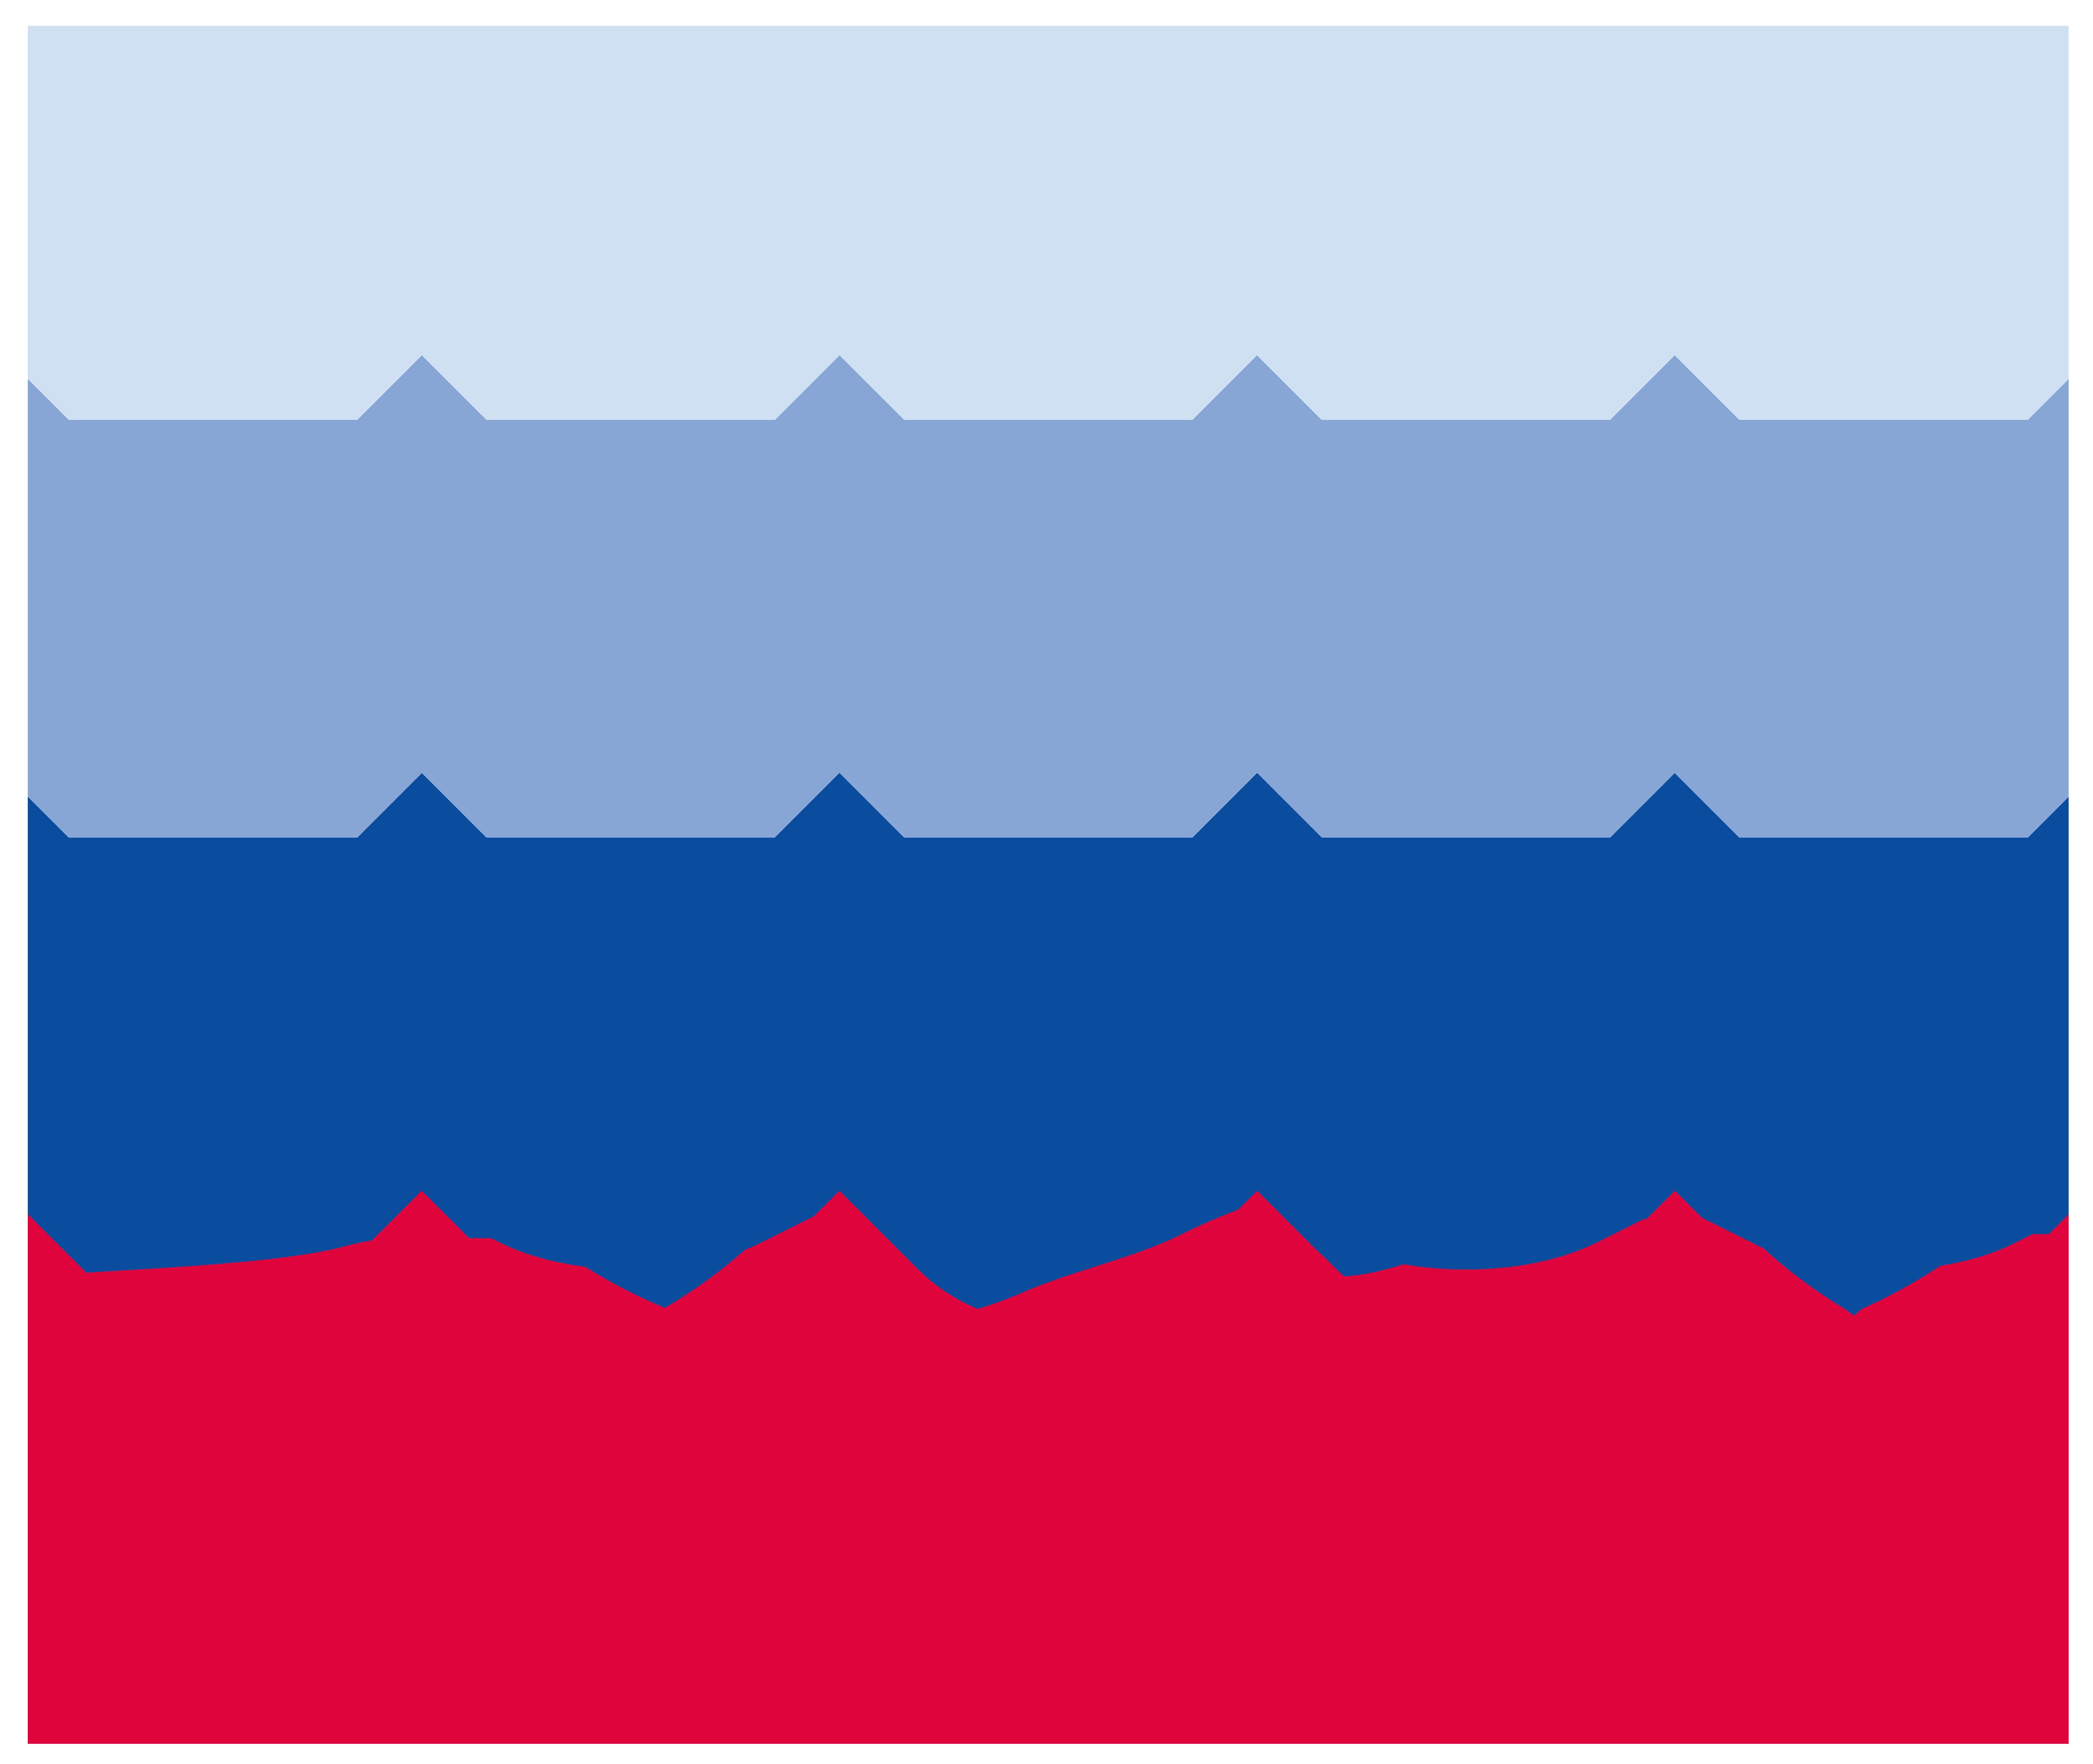 QLogo_RGB 5500x4635px